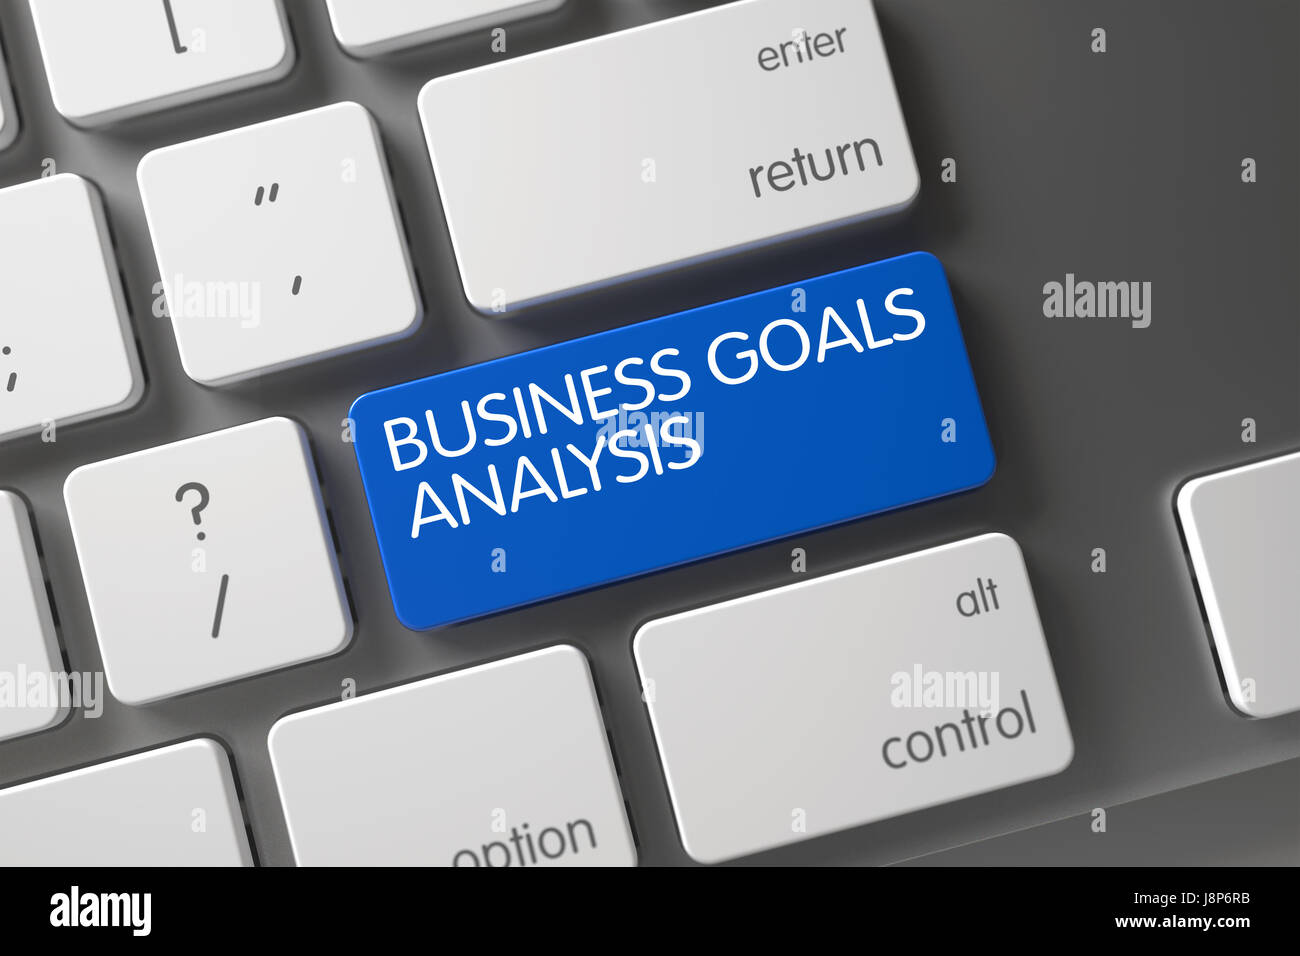 Business Goals Analysis Key. 3D. - Stock Image